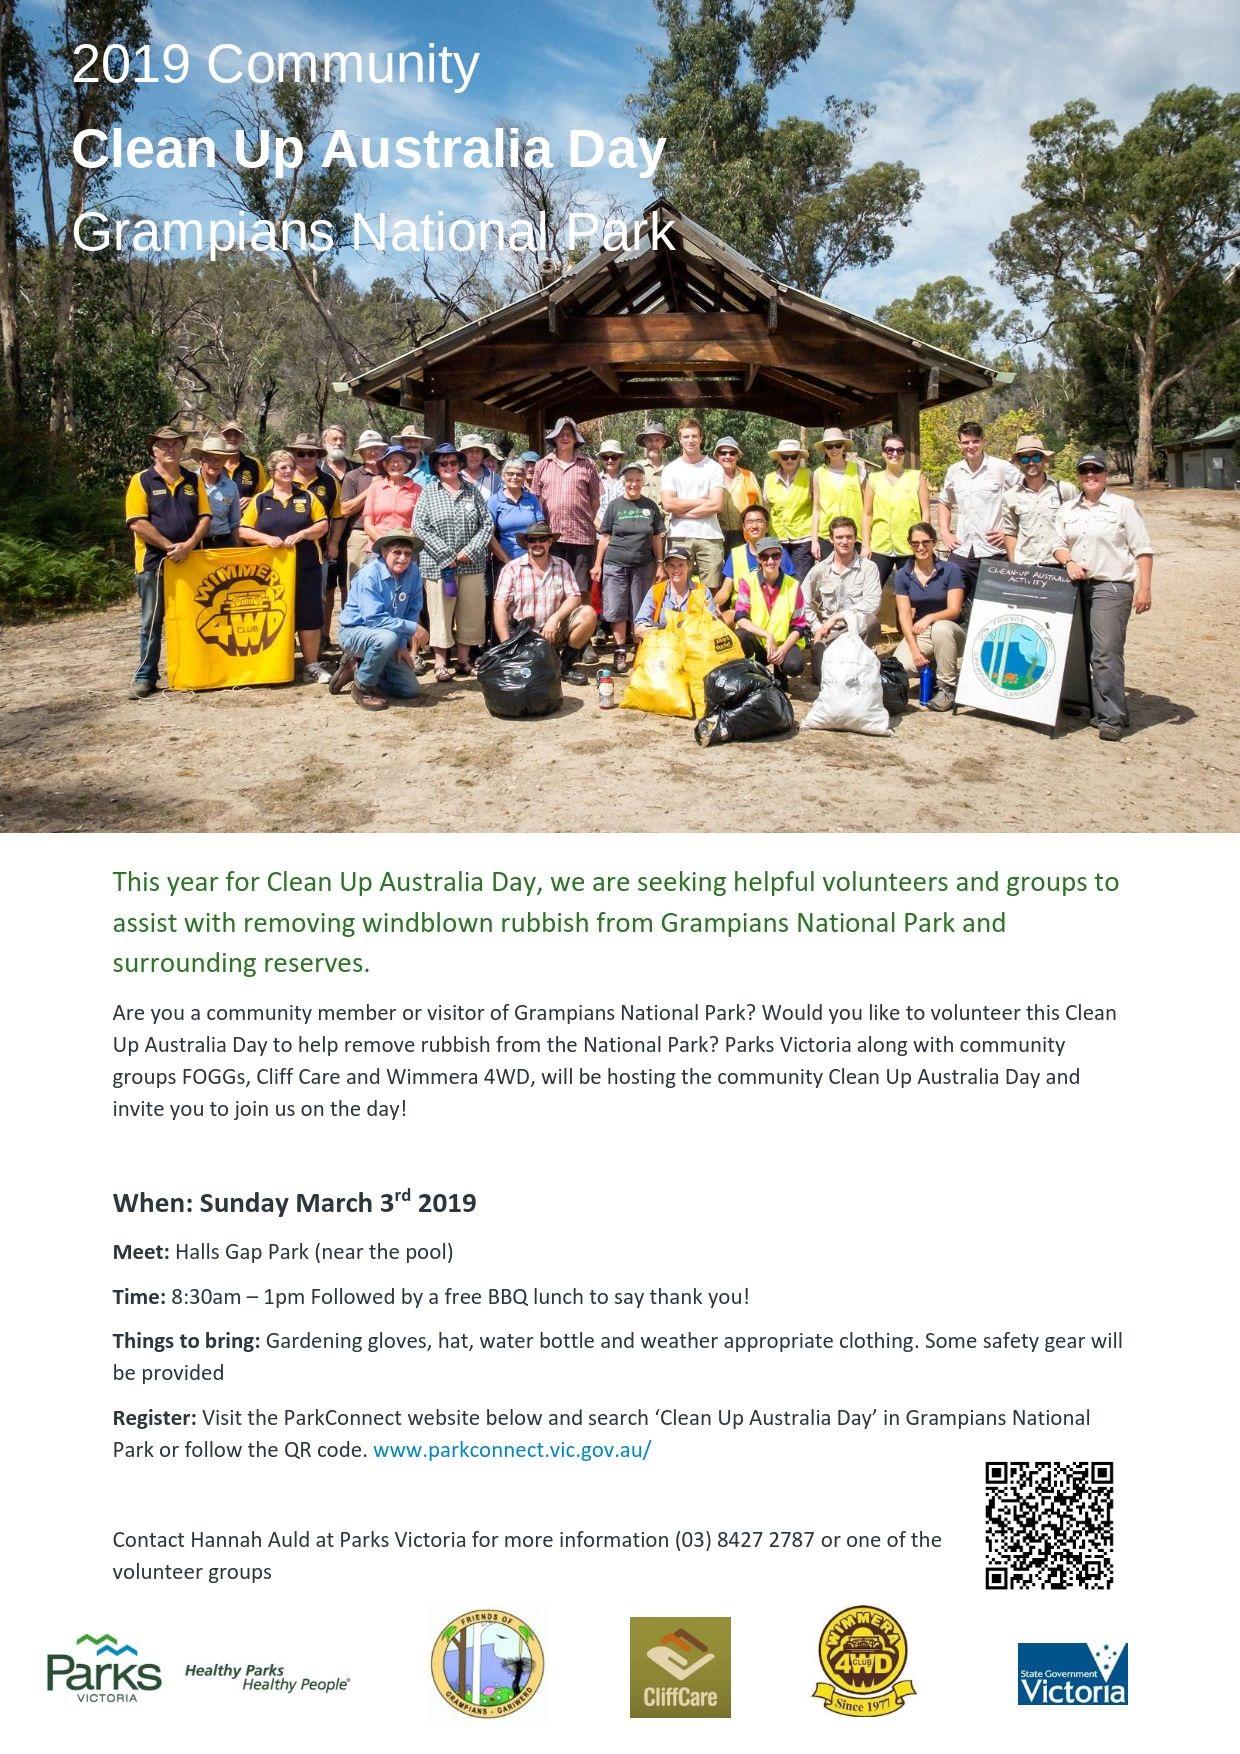 2019 Community Clean Up Australia Day Grampians National